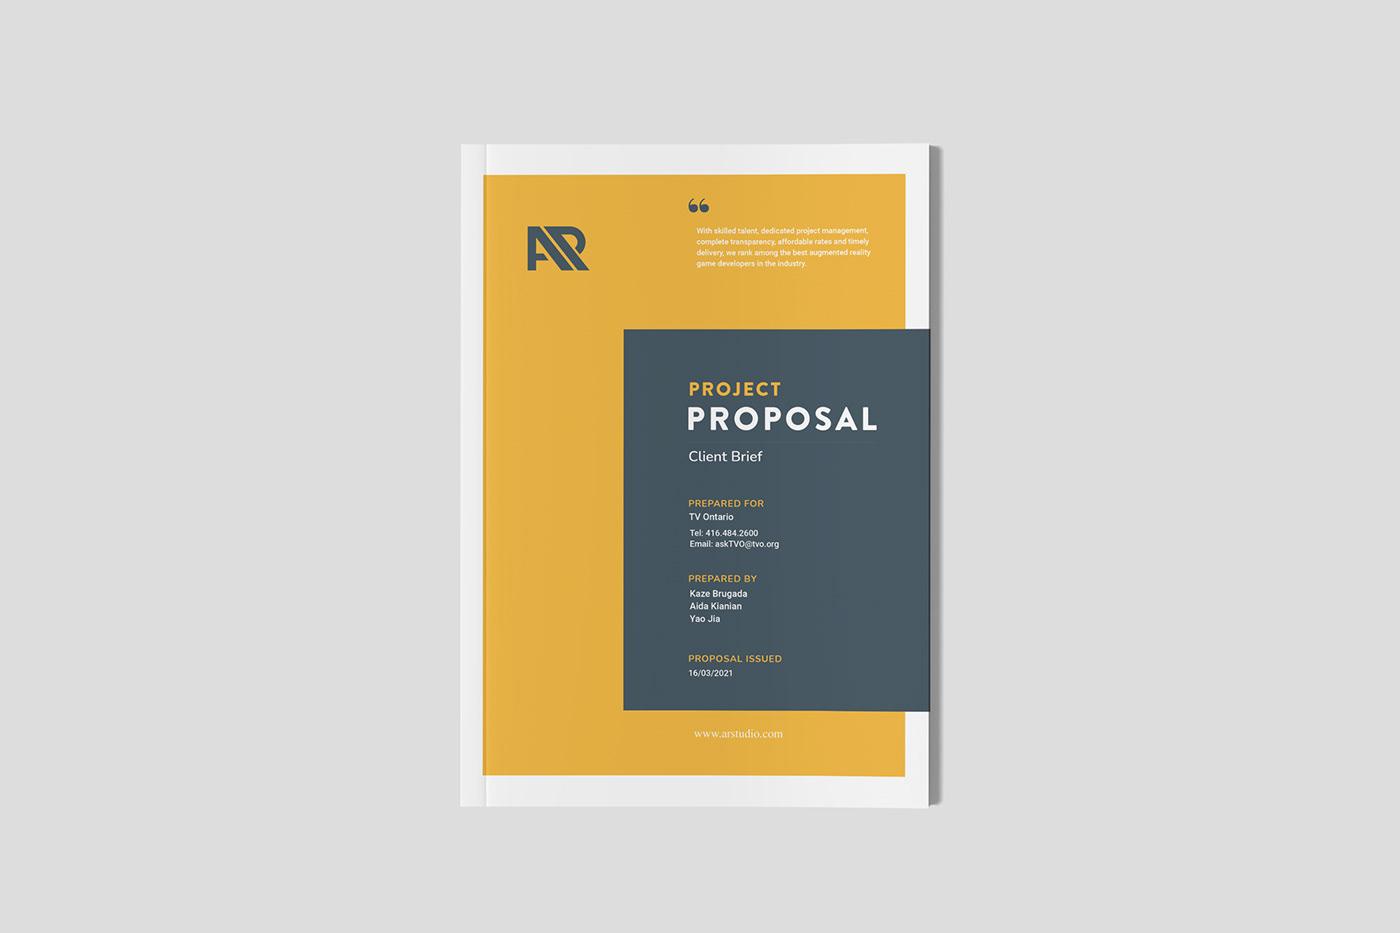 application business ganttchart presentation Project projectproposal Proposal